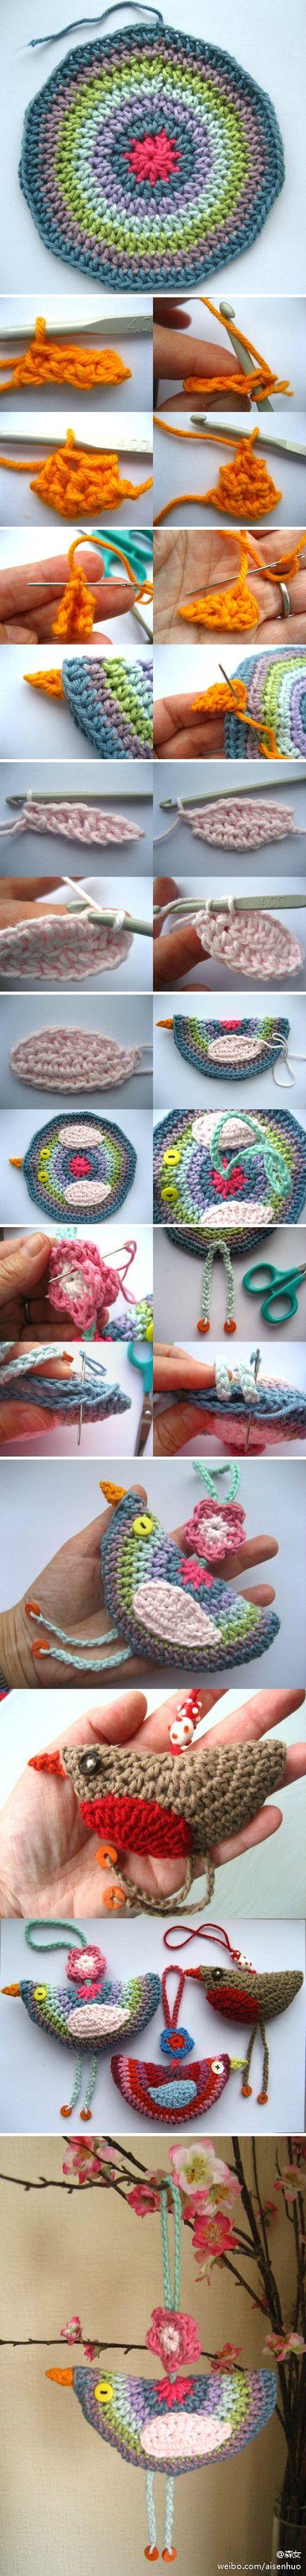 Crochet Bird - Photo Tutorial